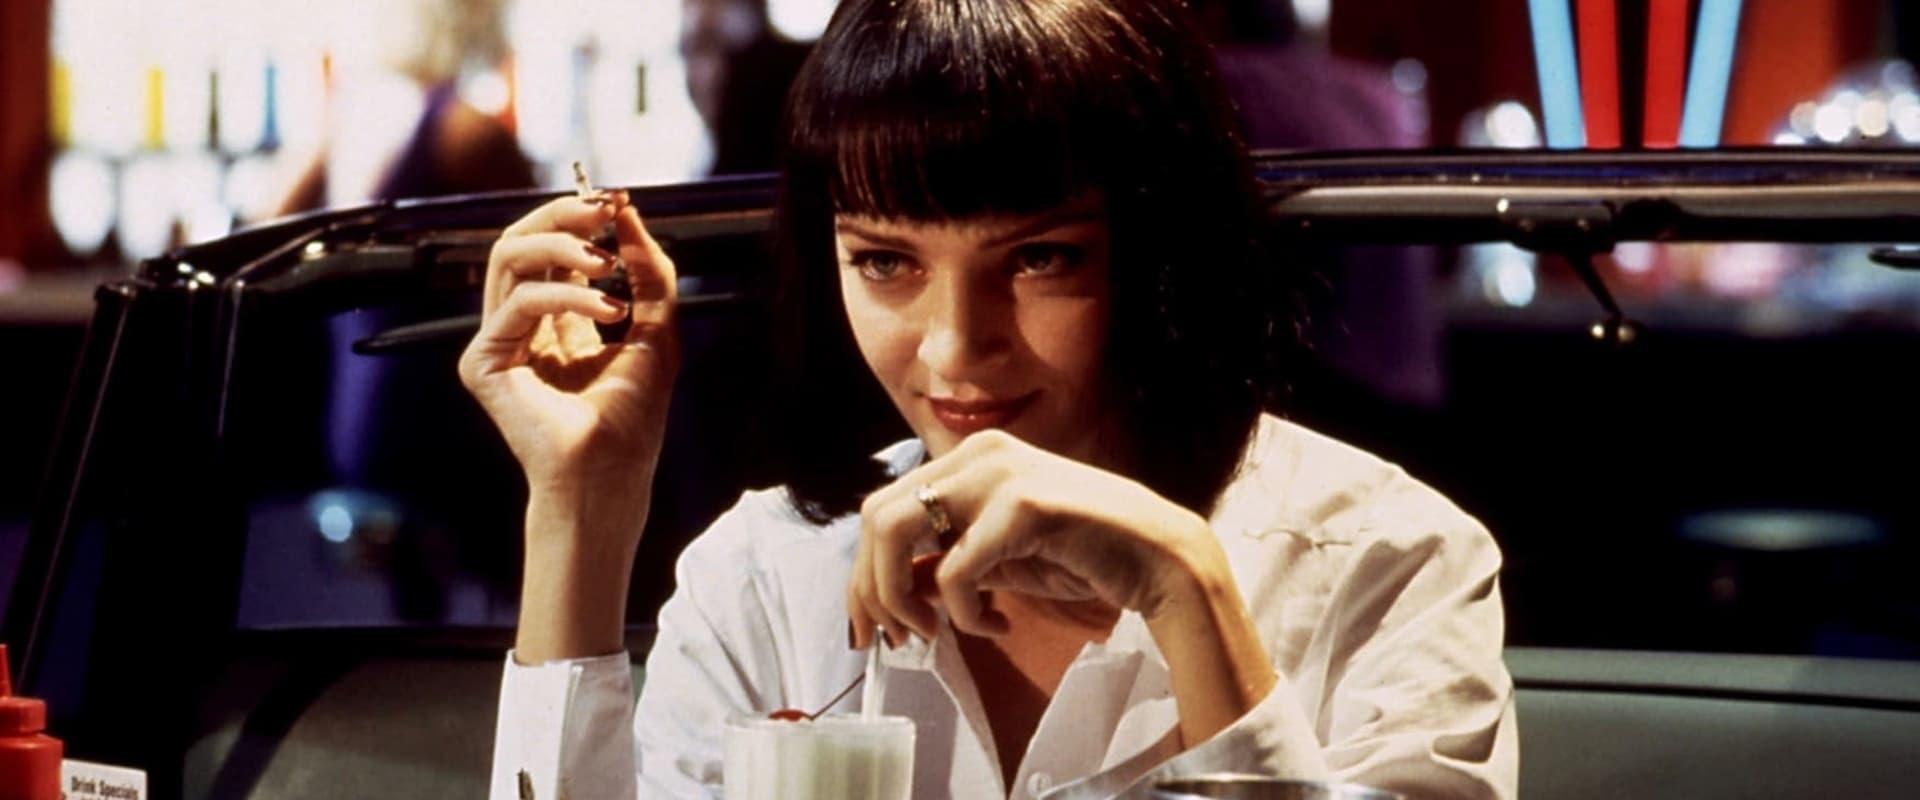 Pulp Fiction 123Movies Watch Full Movie Online Stream